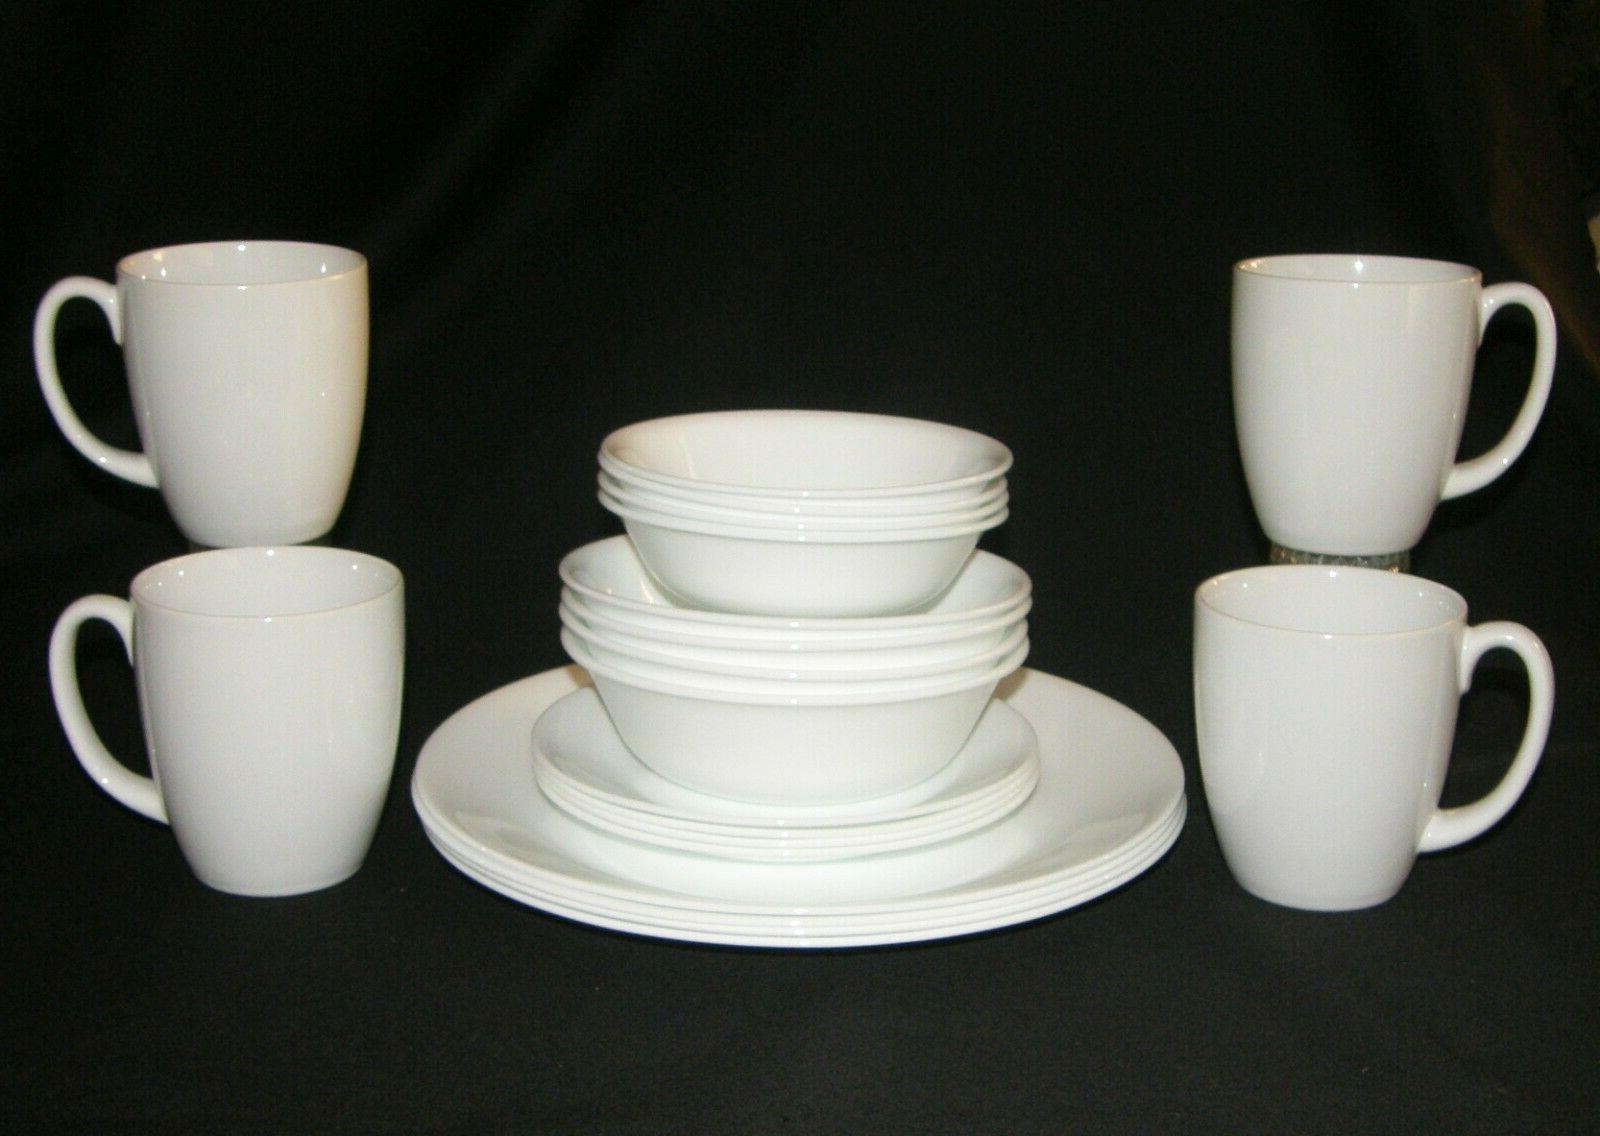 NEW LivingWare White Dinnerware Set 4 NEW